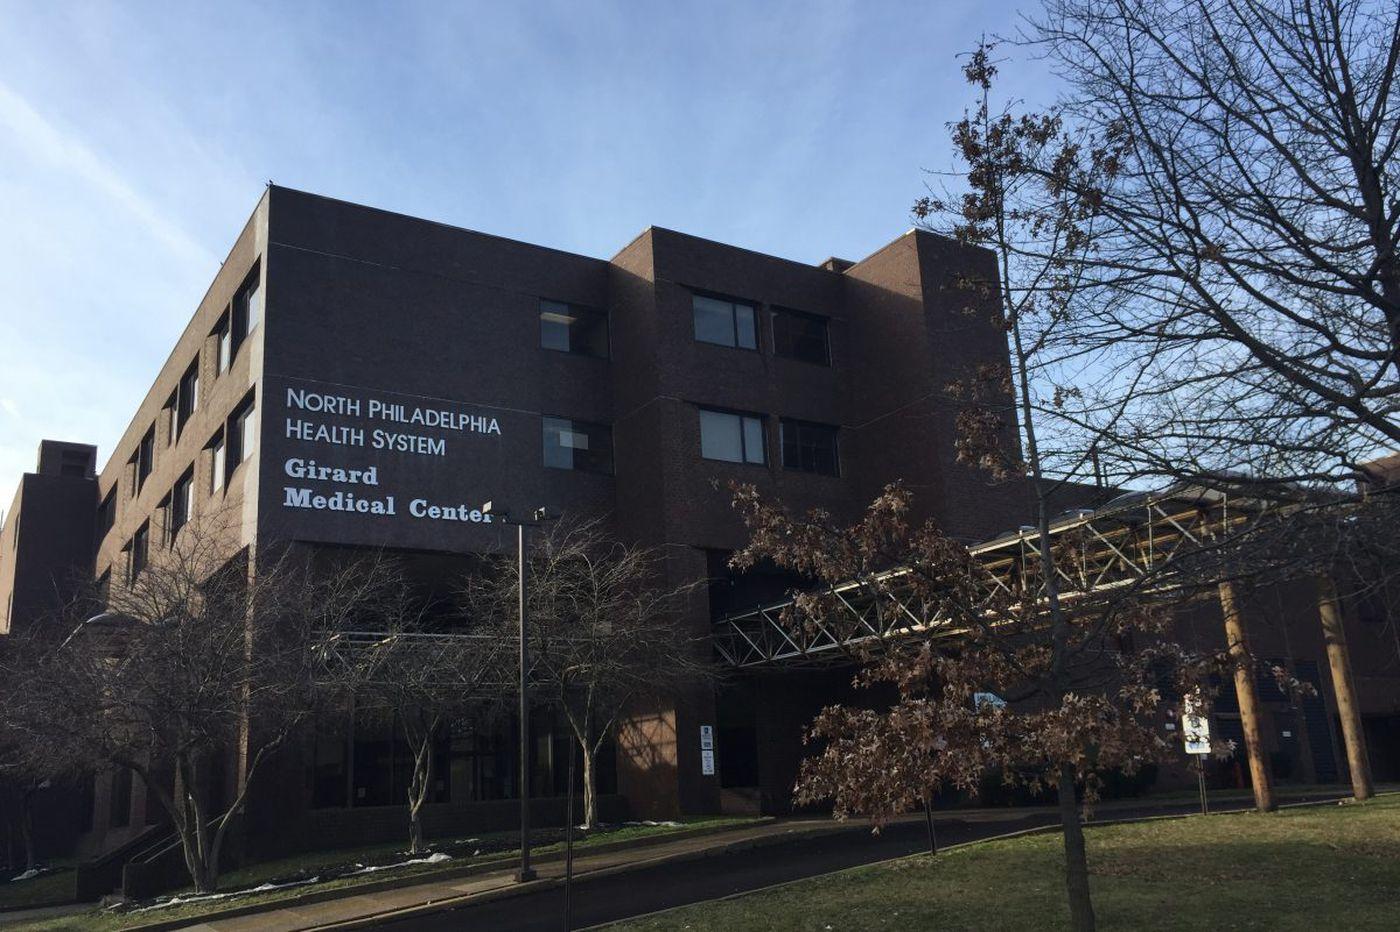 Girard Medical Center insiders named to run bankrupt nonprofit